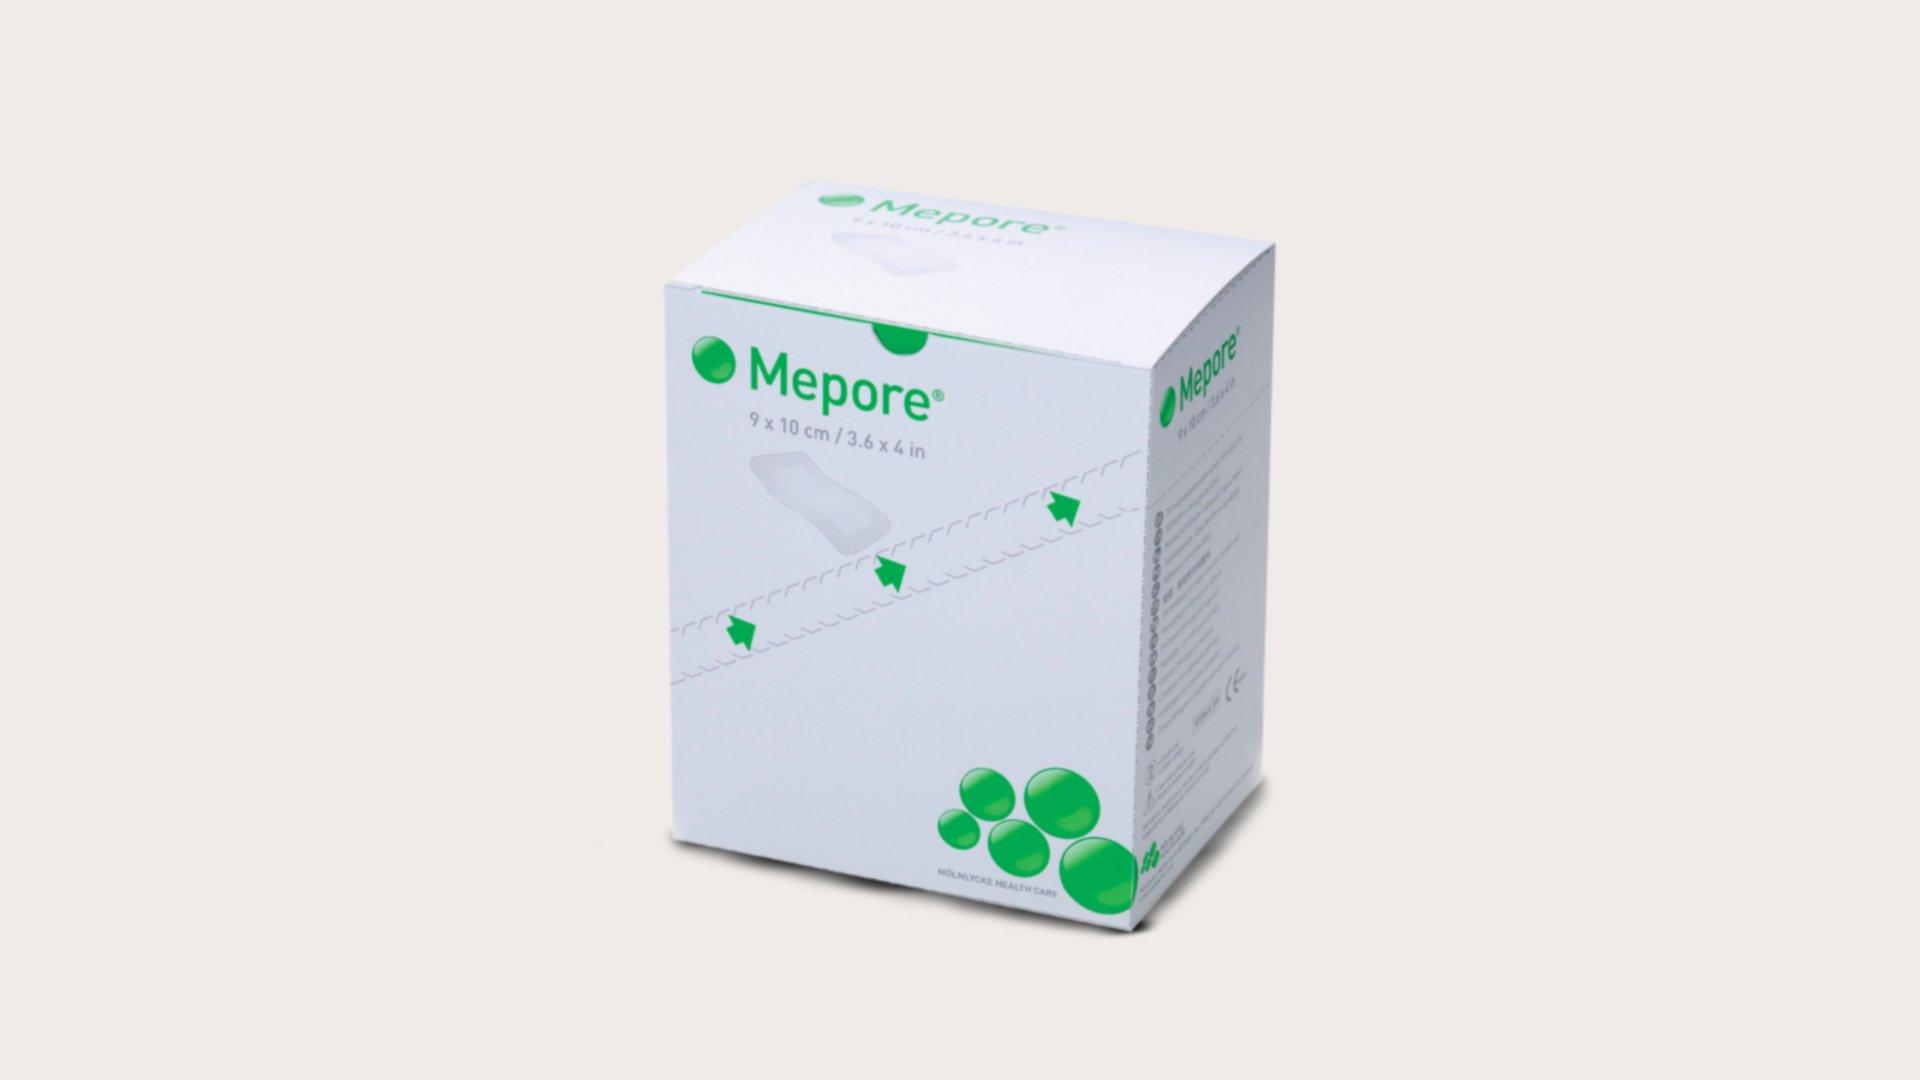 Mepore image